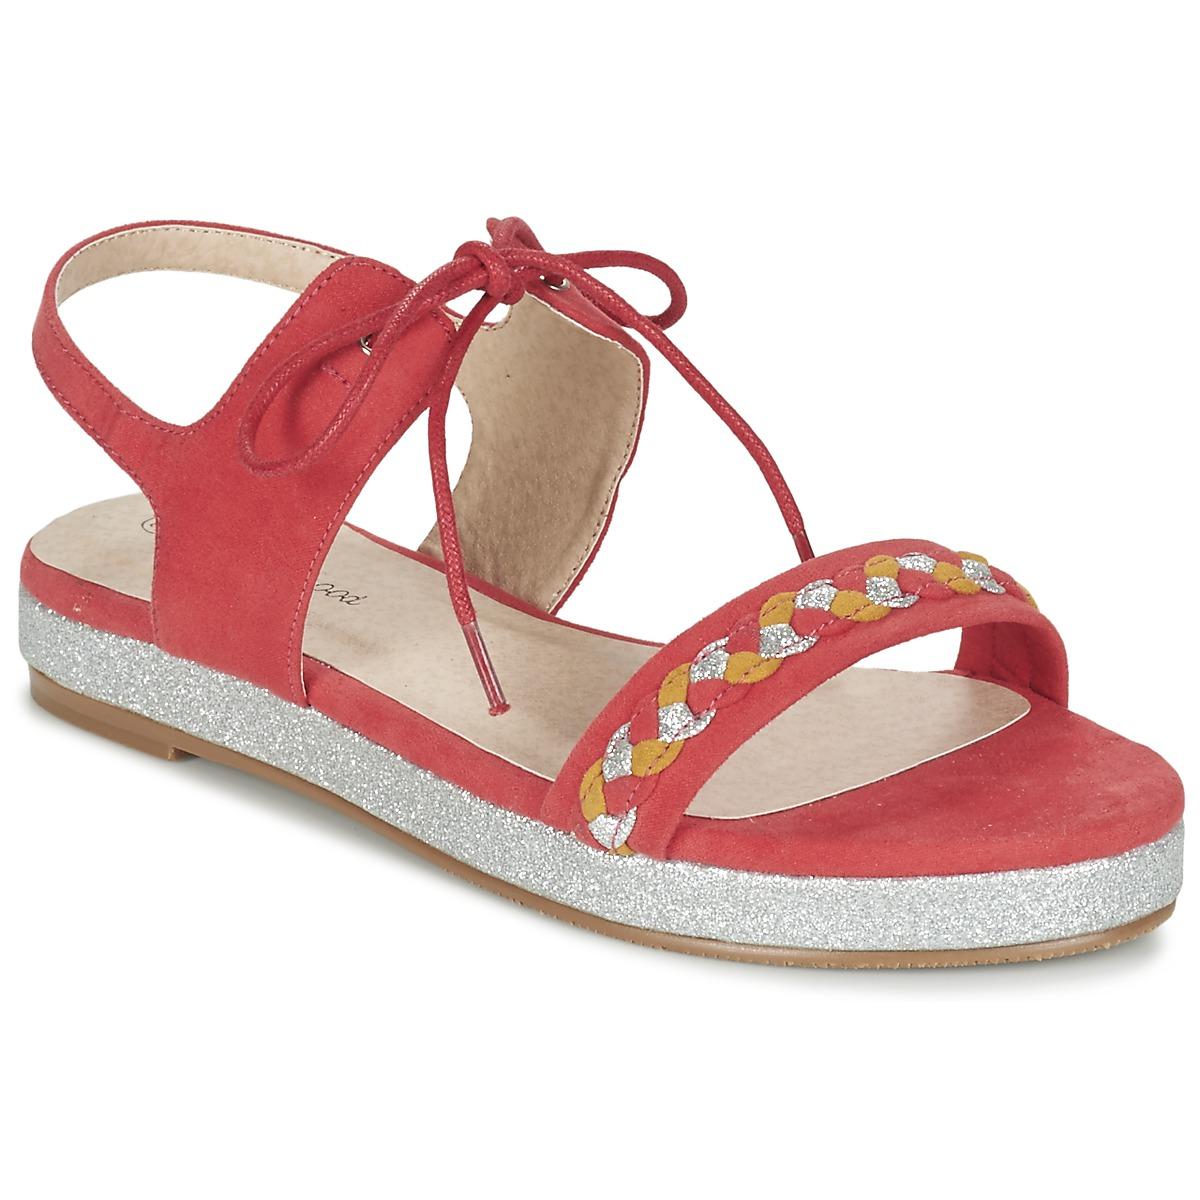 Moony Mood GLOBUNE Rose - Kostenloser Versand bei Spartoode ! - Schuhe Sandalen / Sandaletten Damen 20,99 €